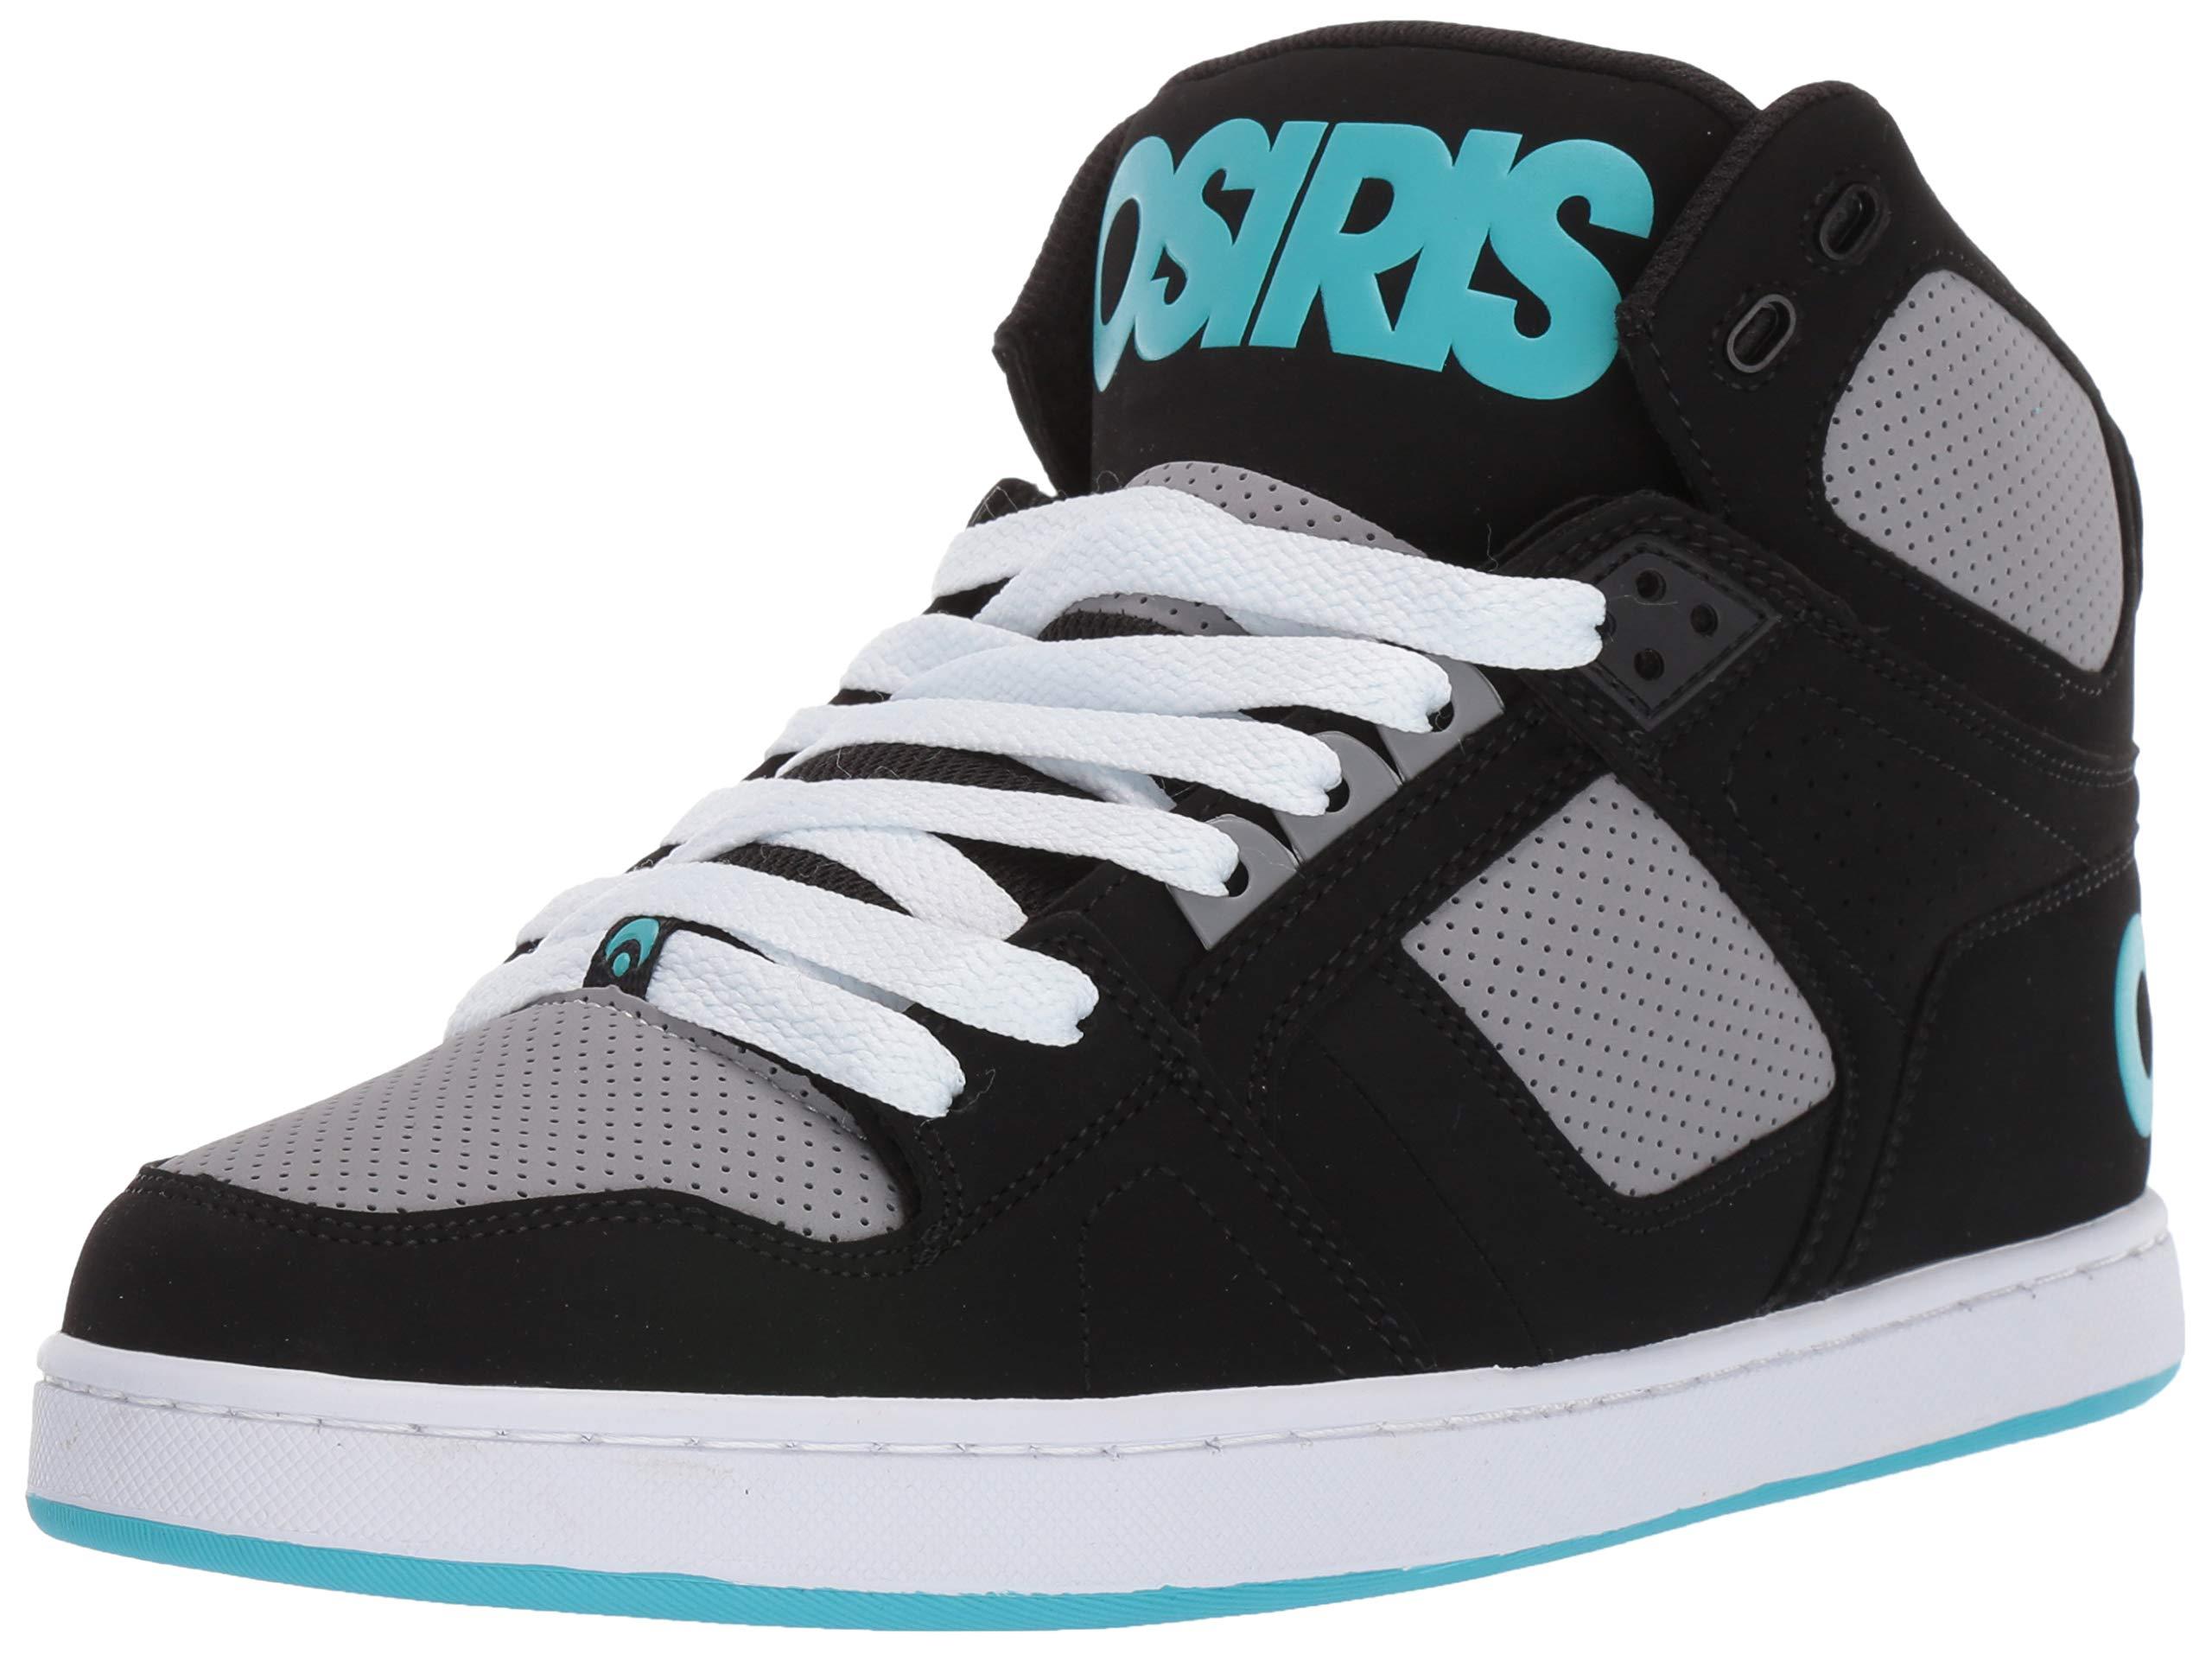 Osiris Mens Skate Shoe Black